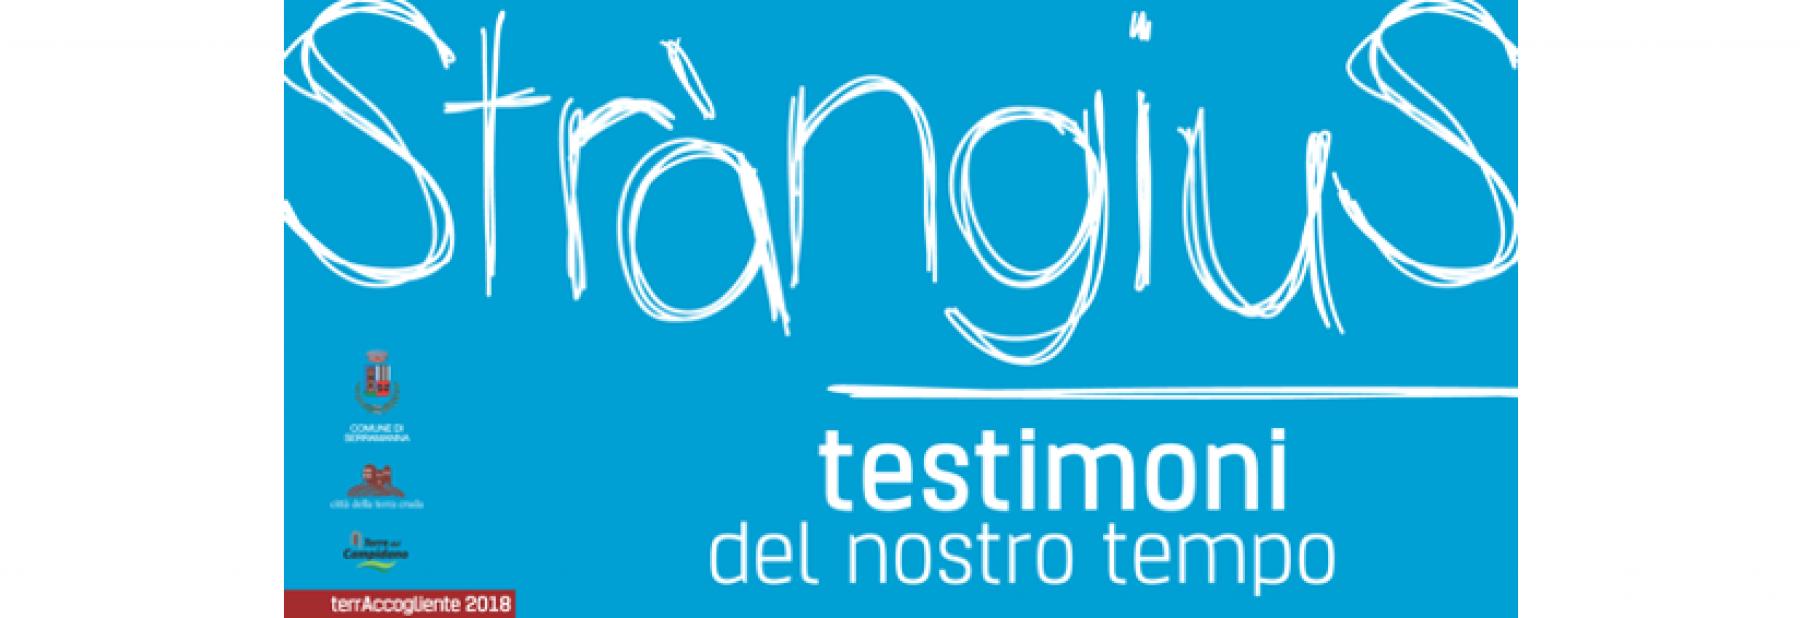 strangius_festival_testata.png